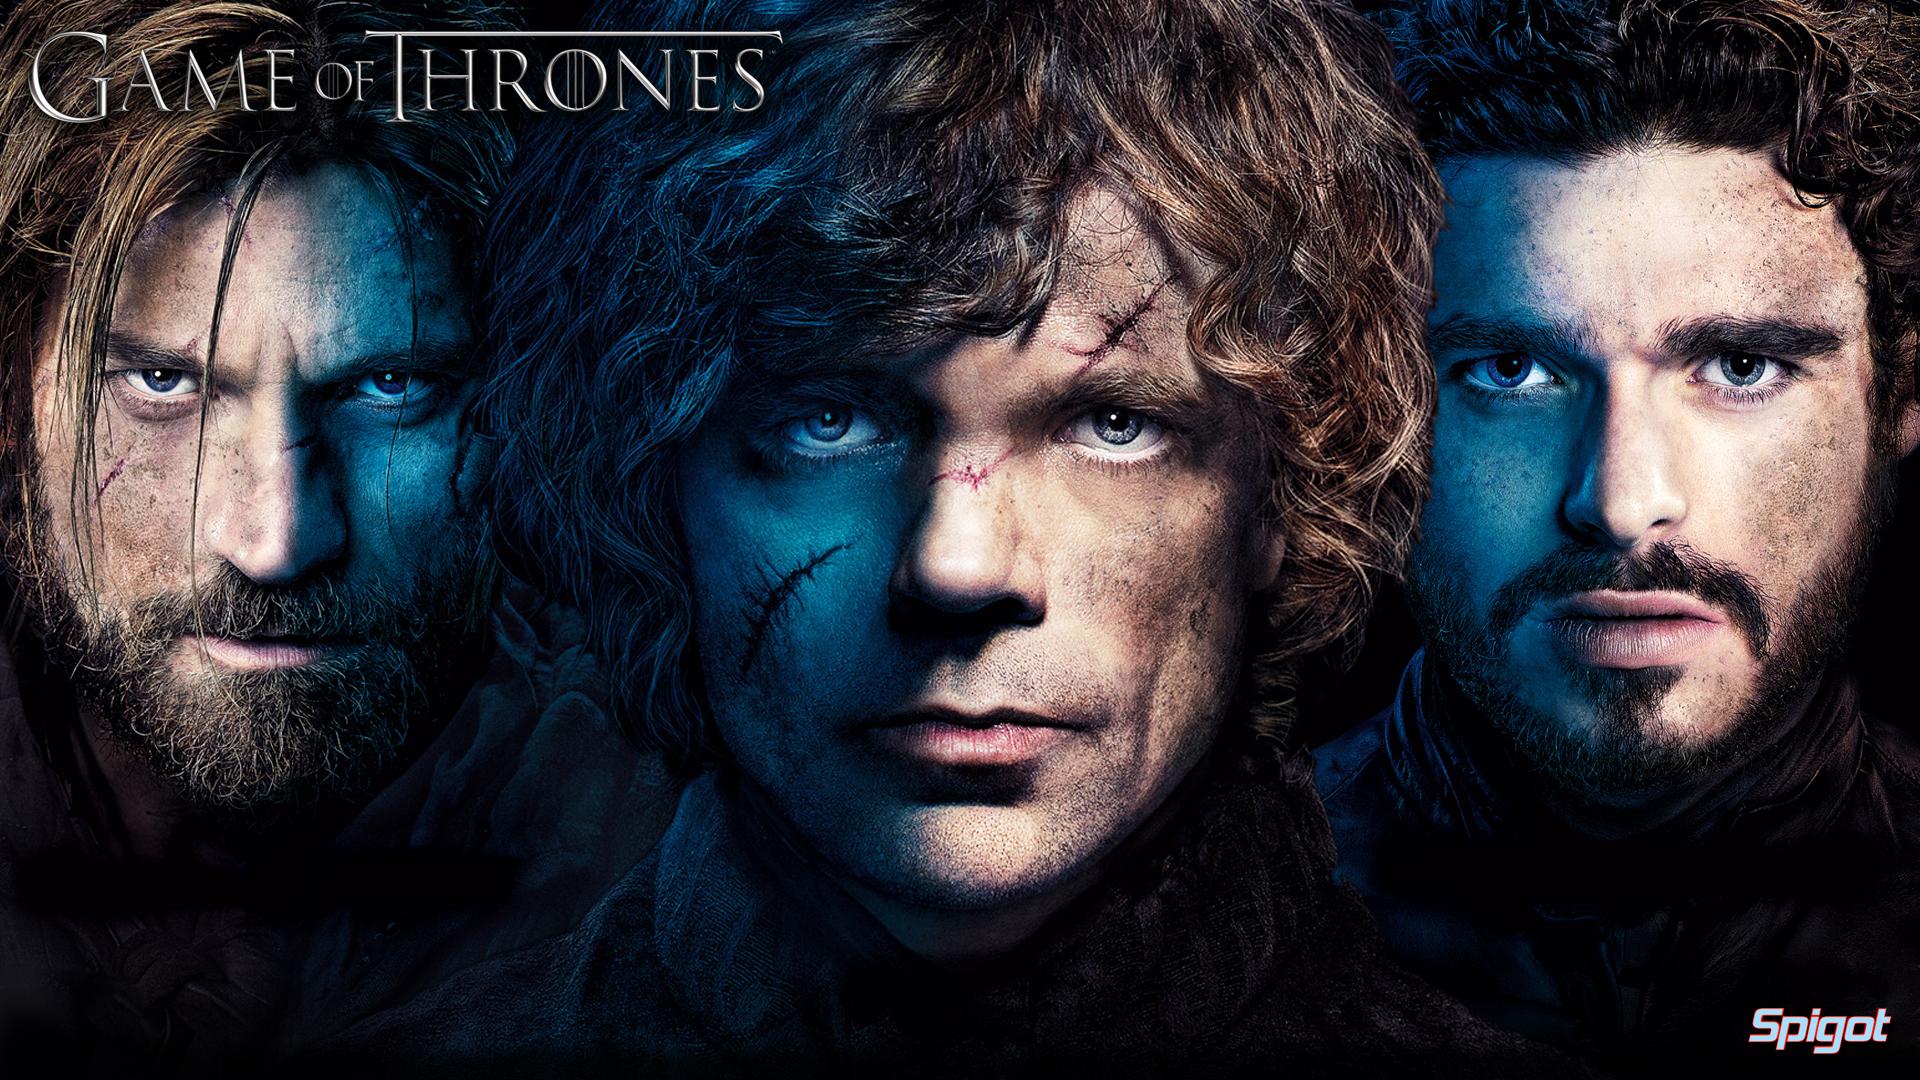 Game Of Thrones George Spigot S Blog